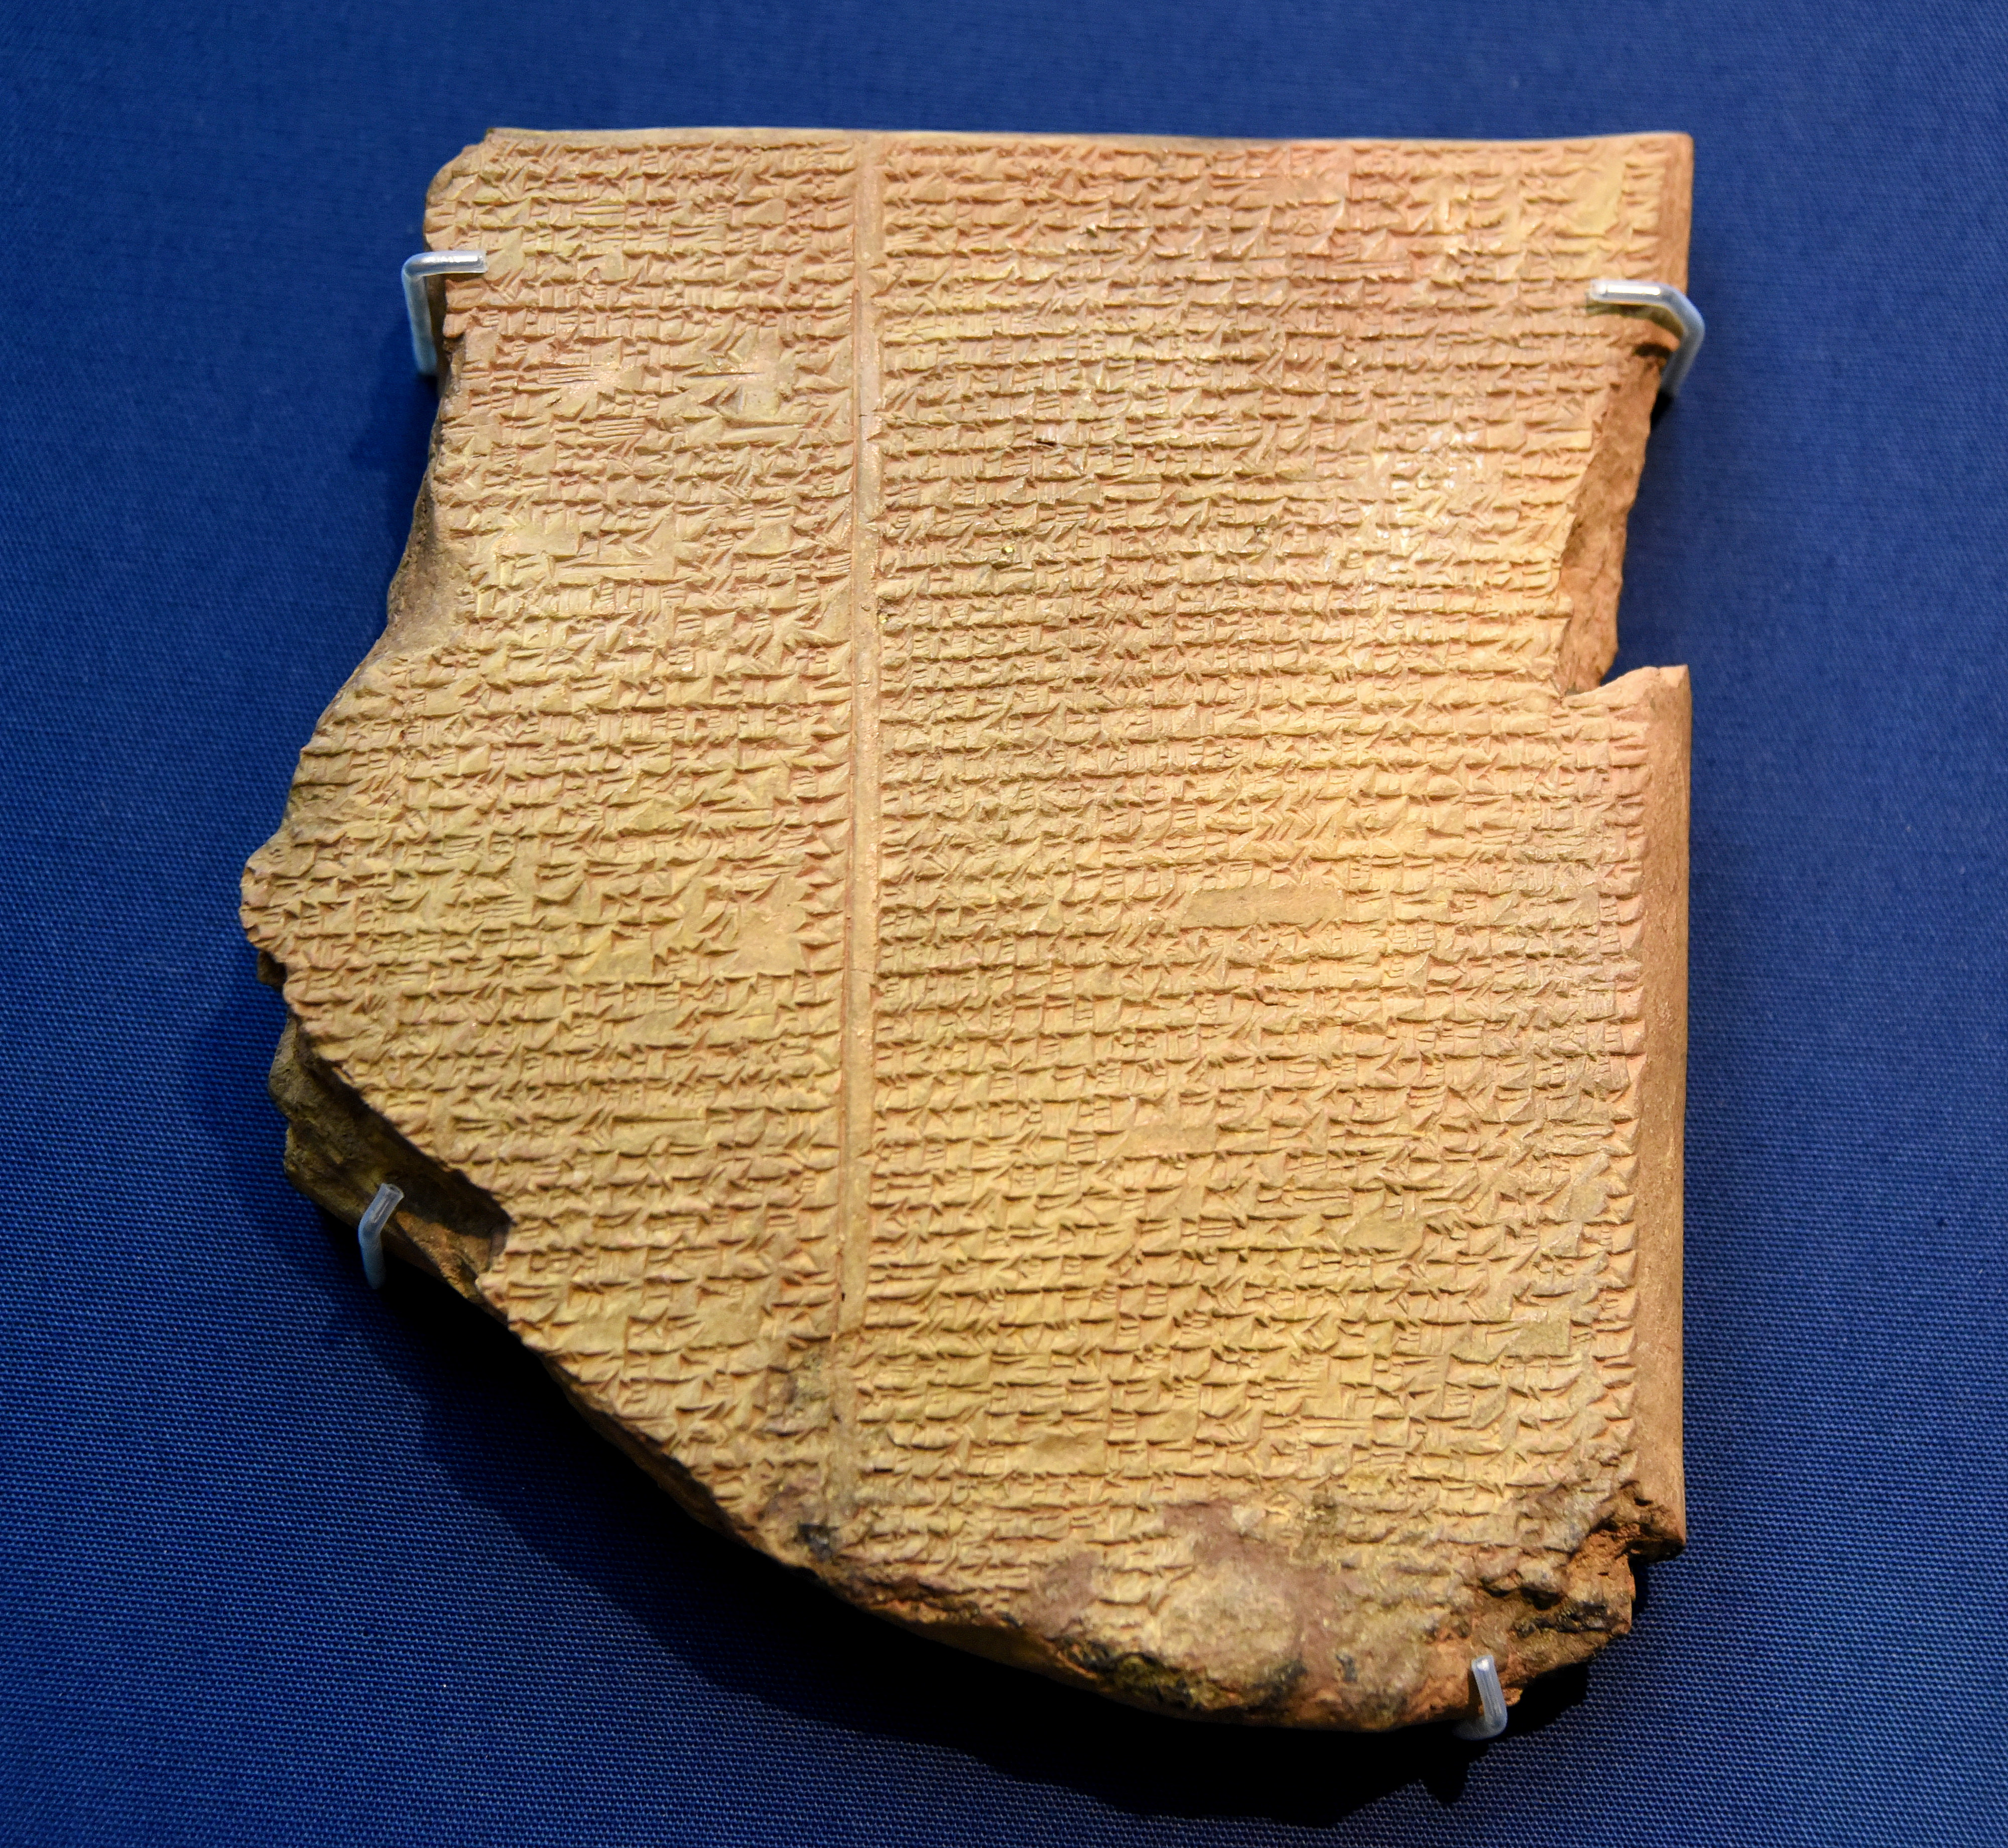 Epic of Gilgamesh image